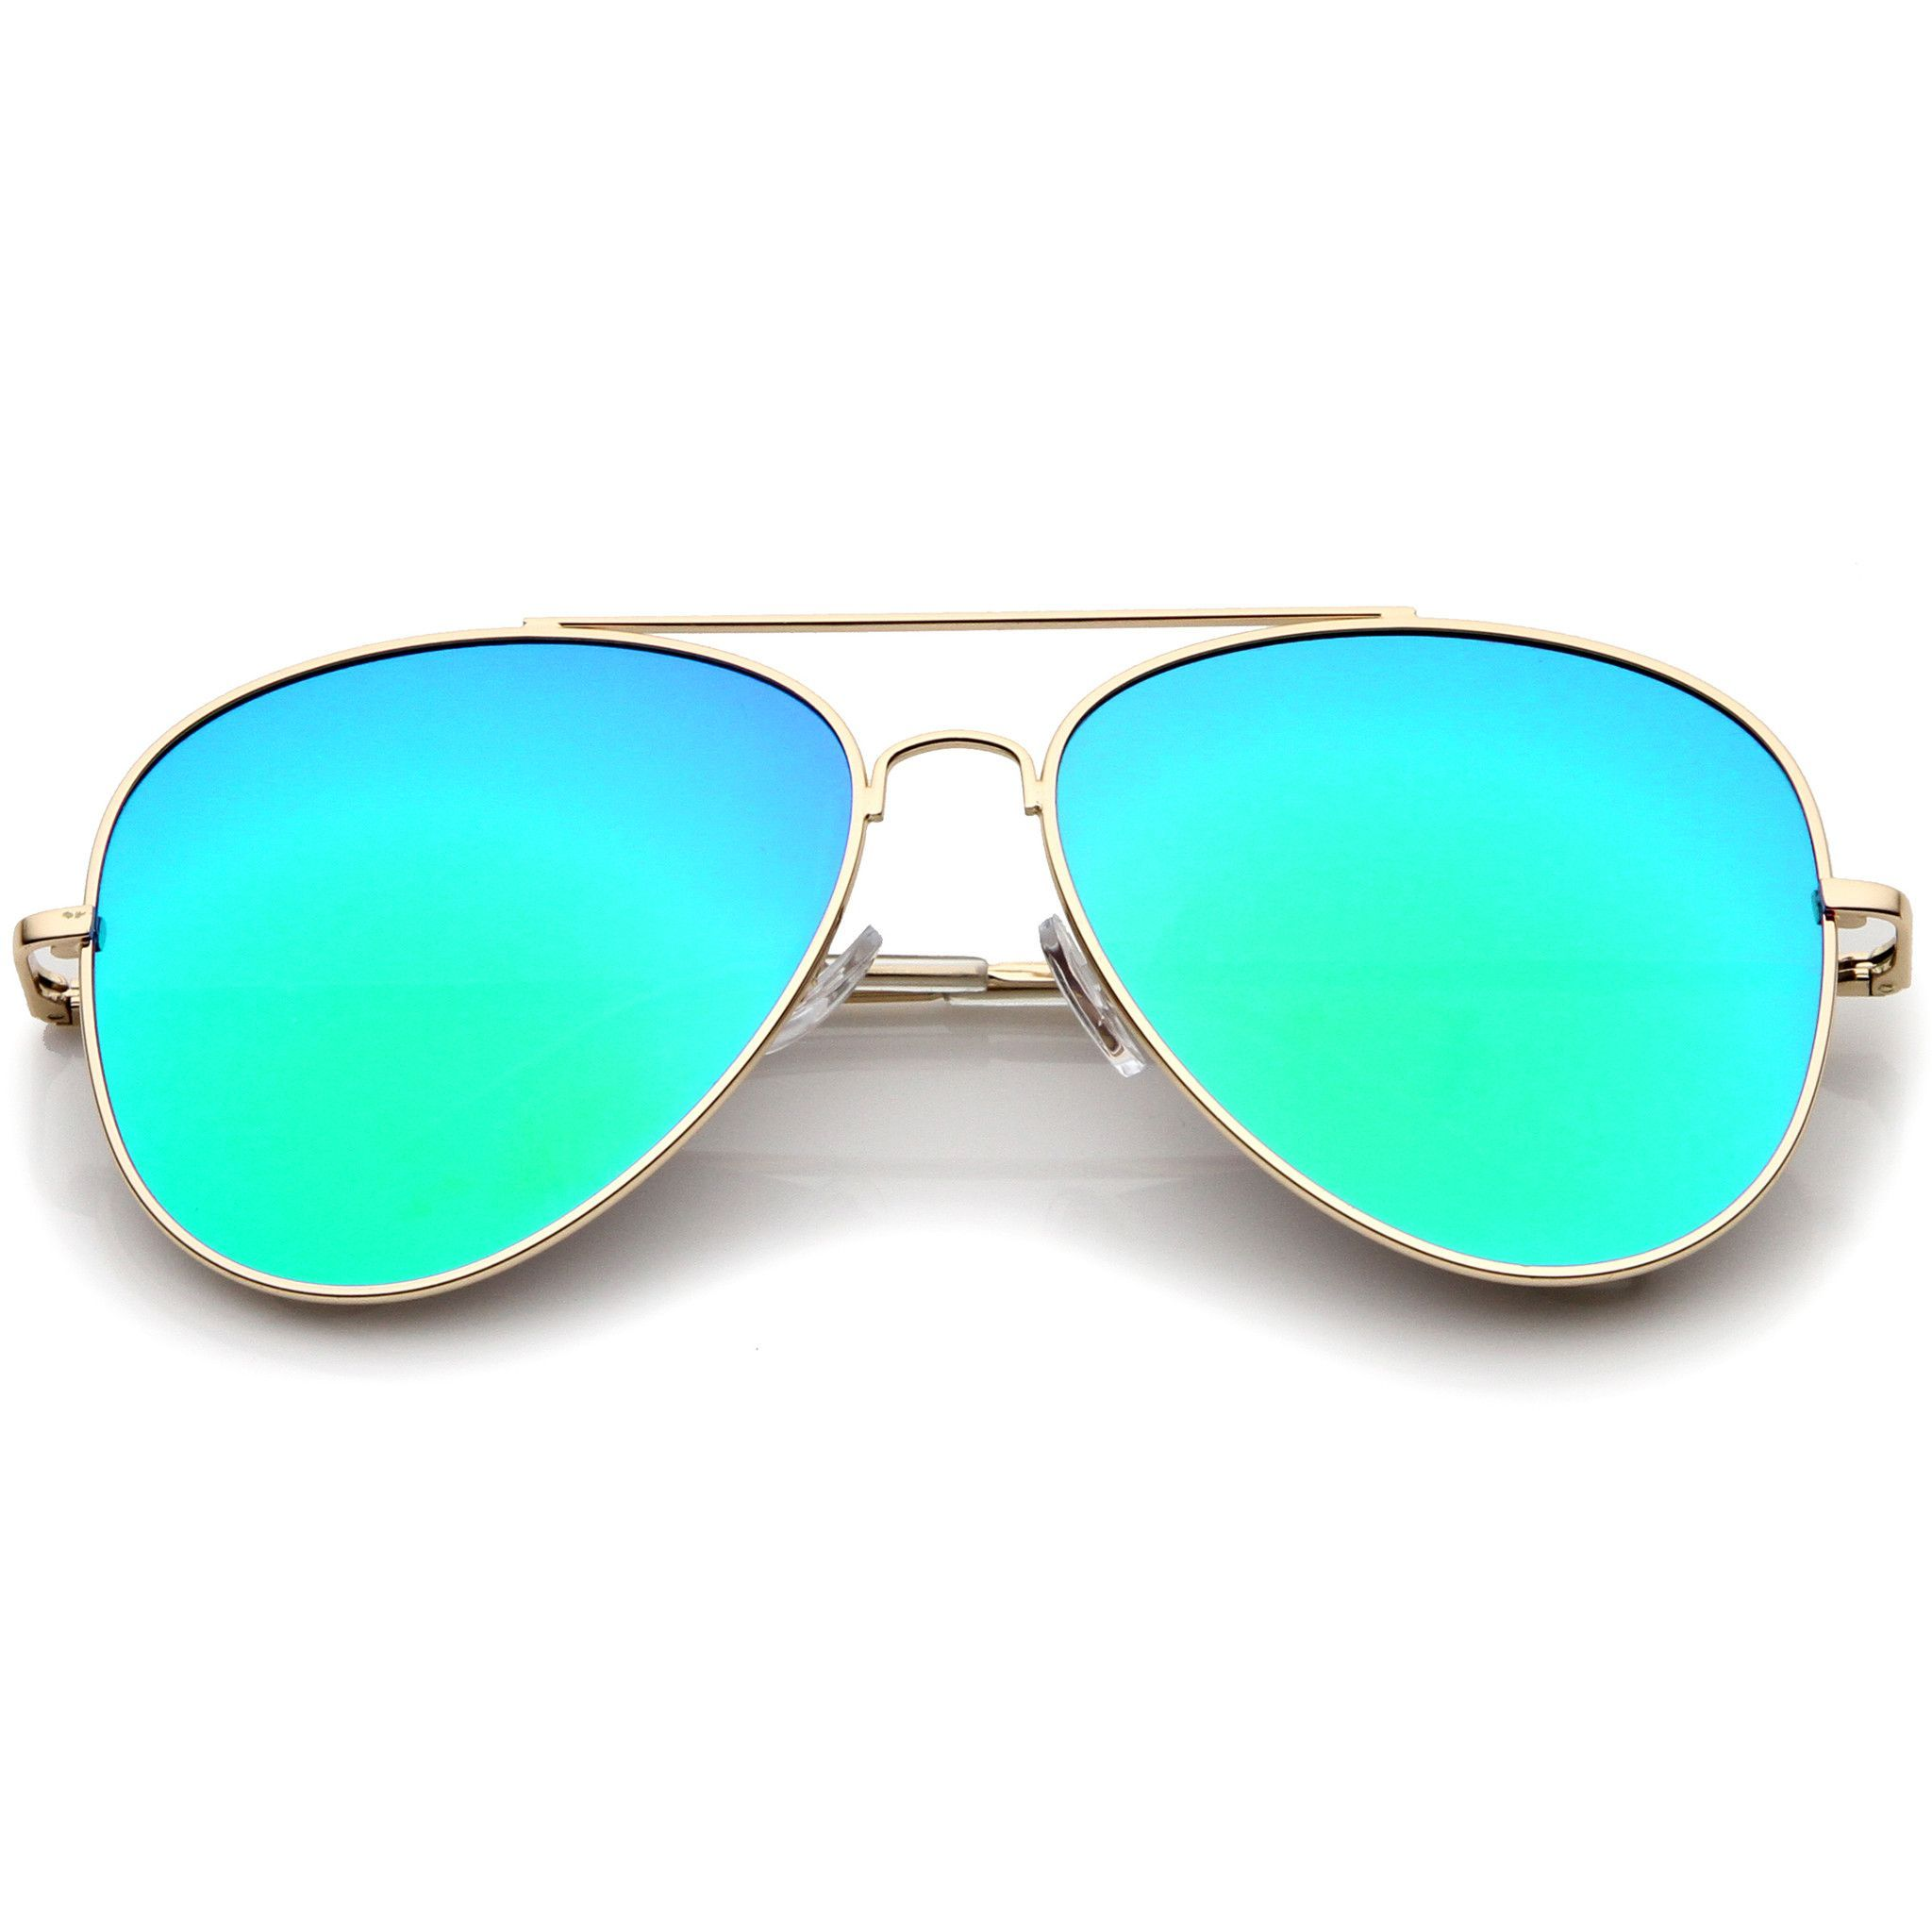 large lens aviator sunglasses  Large Flat Front Mirrored Lens Aviator Sunglasses A485